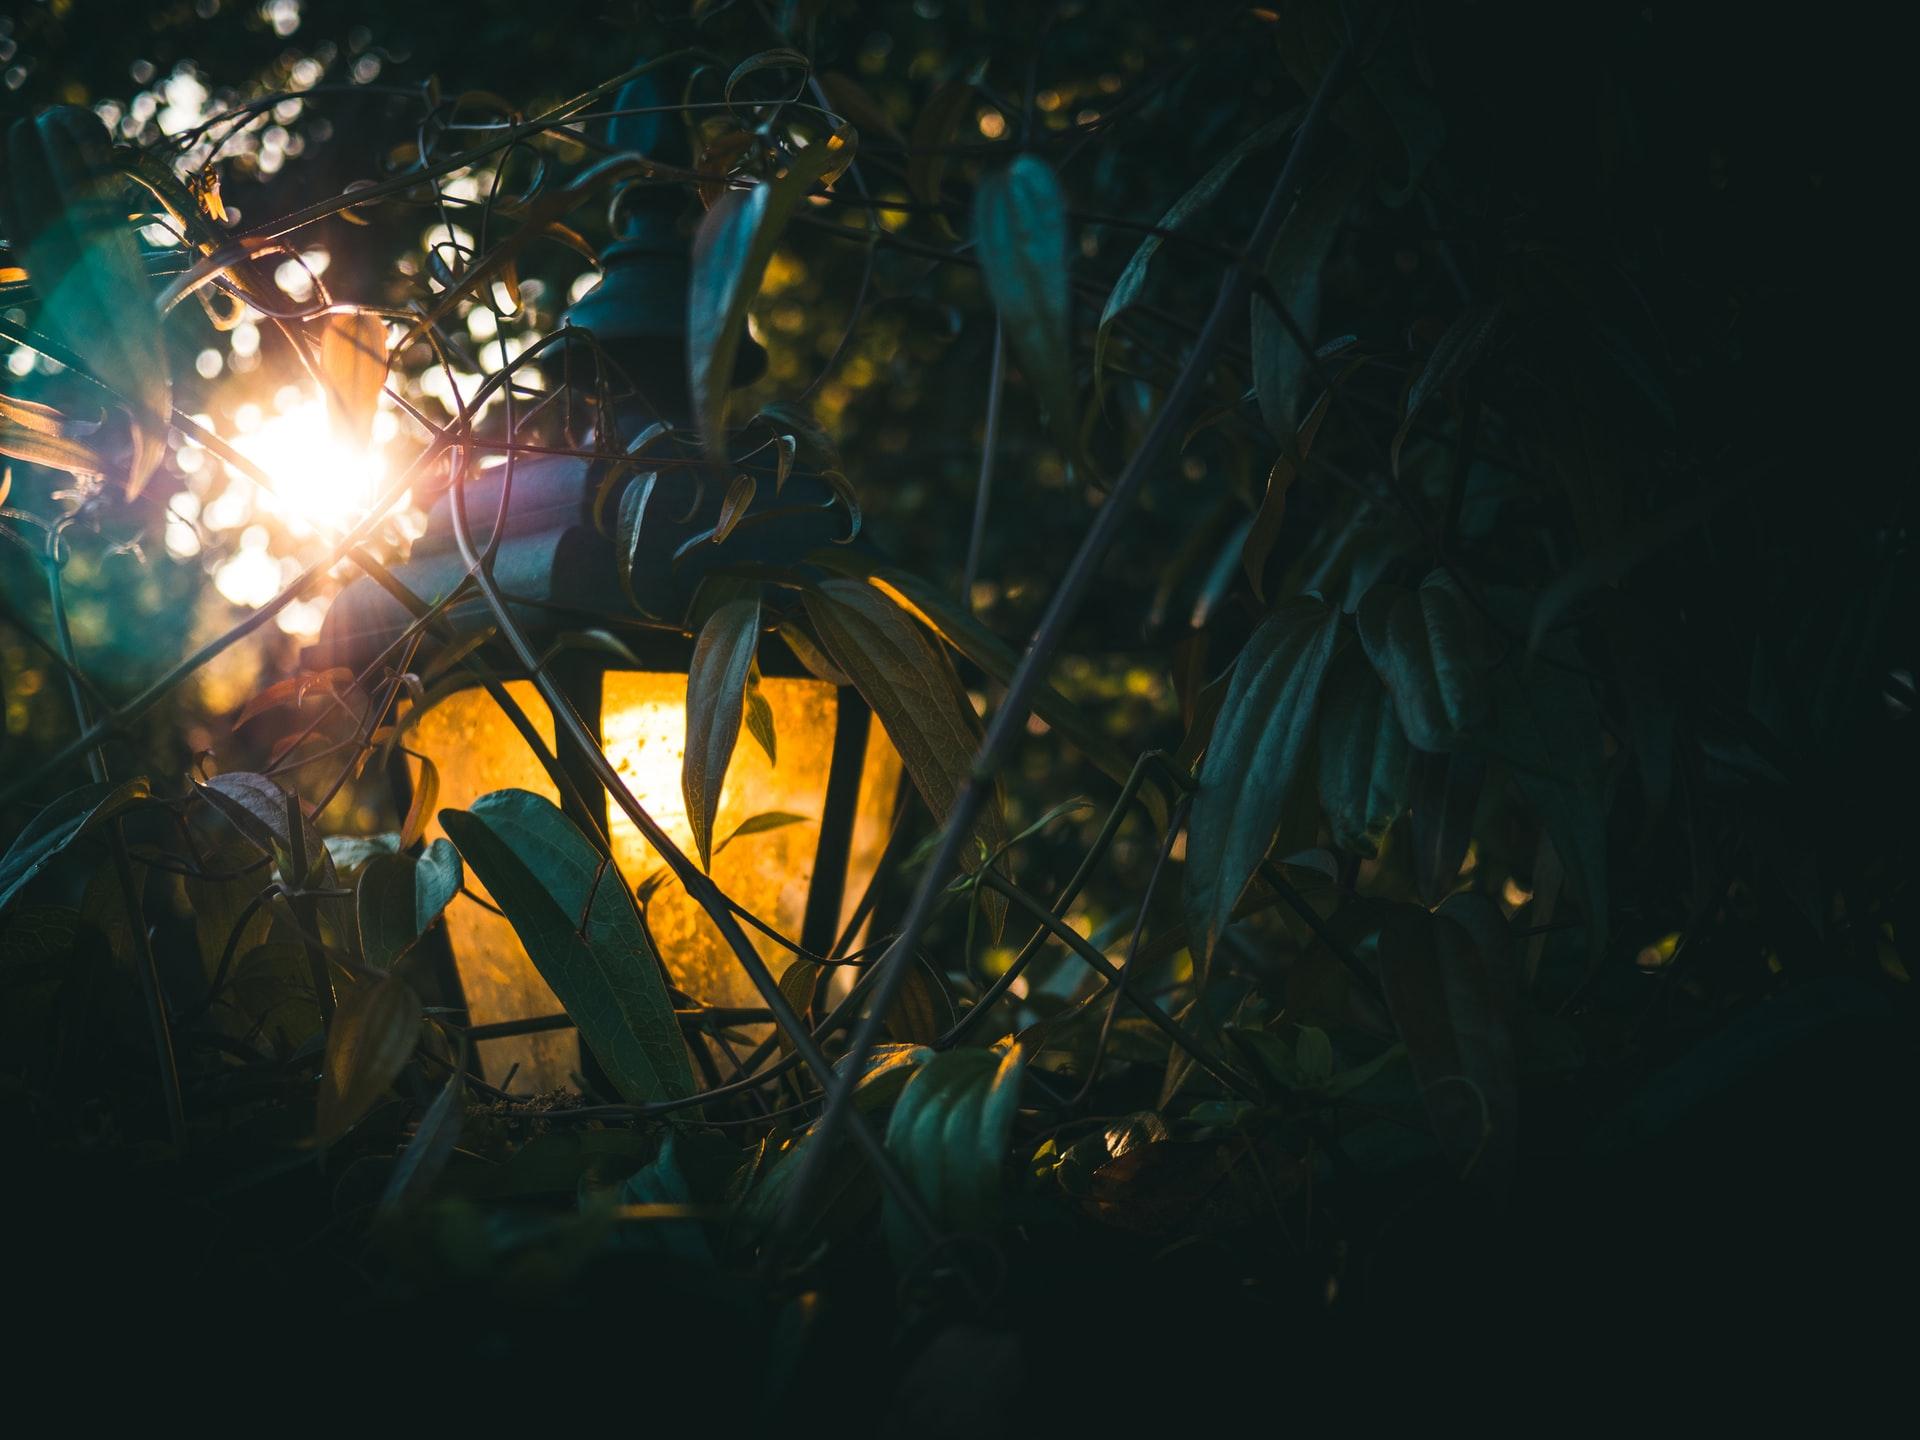 Hidden lantern